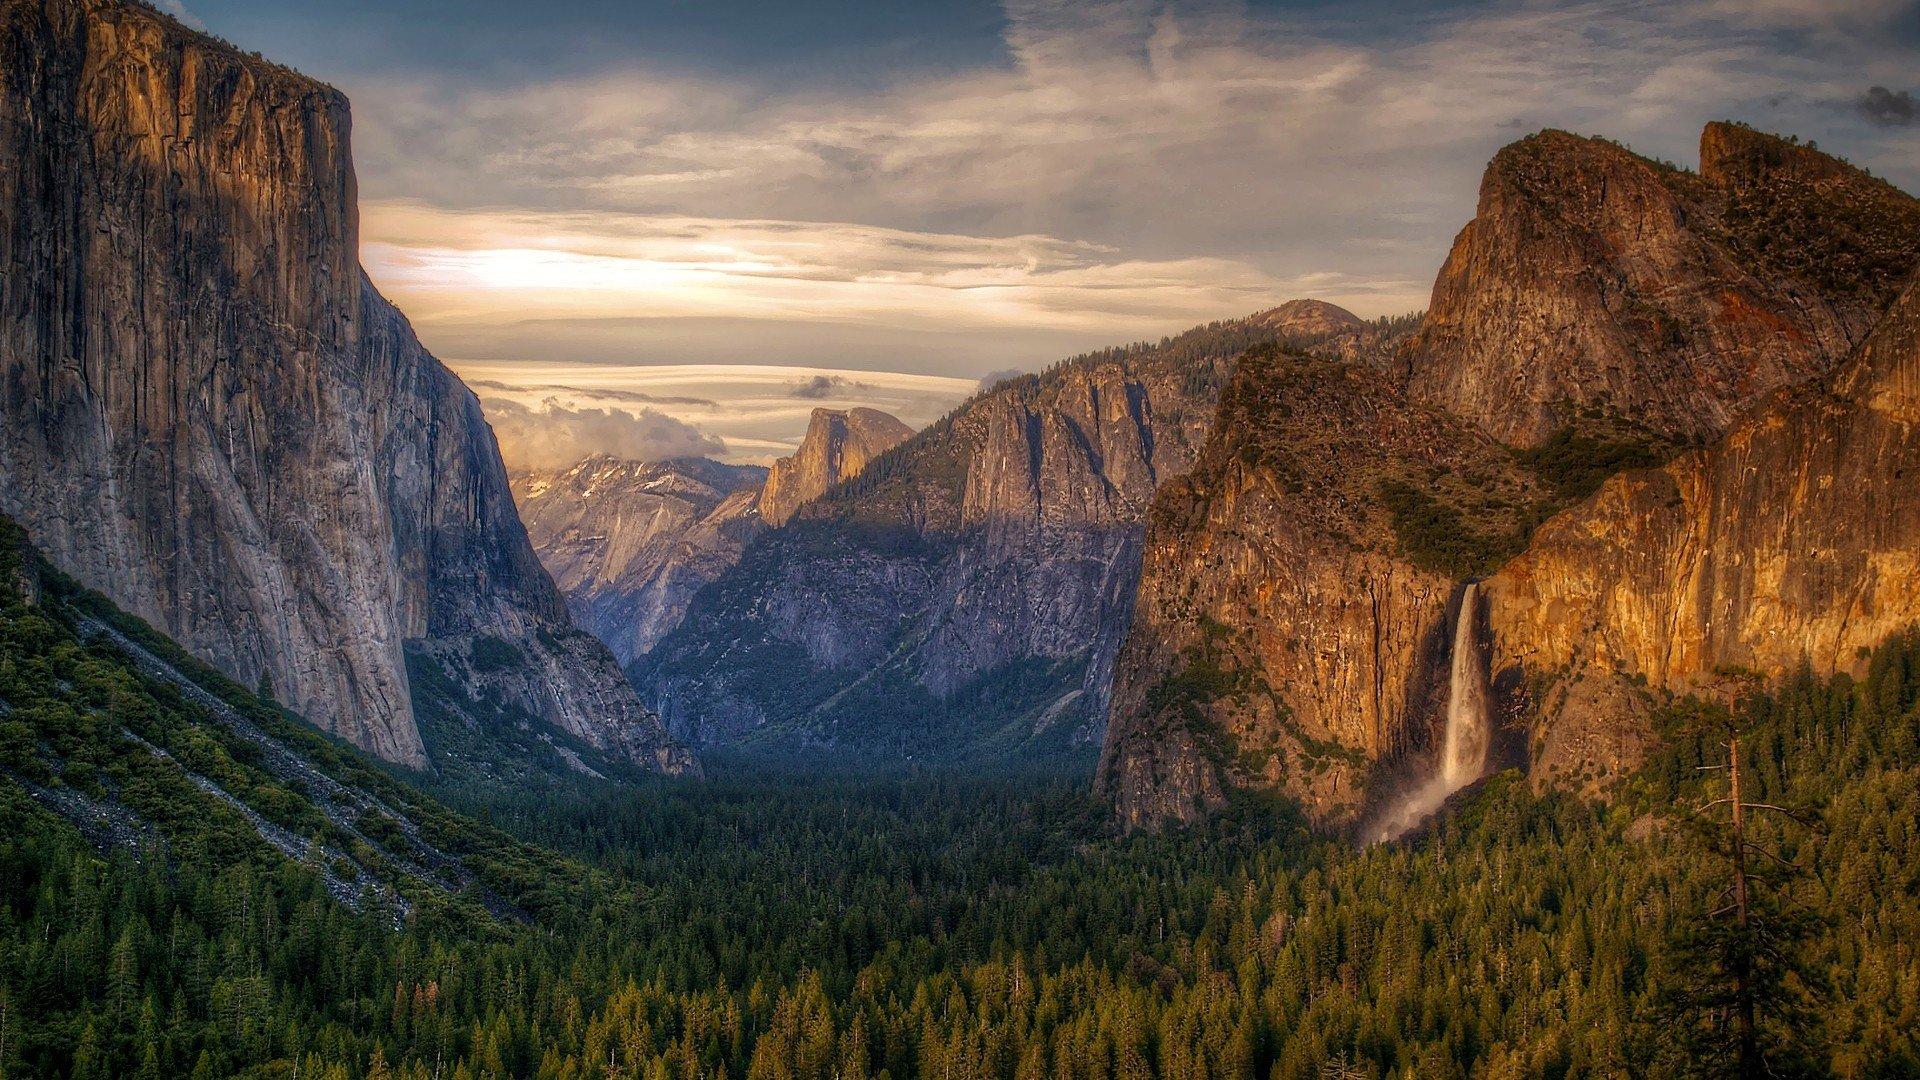 Hd wallpaper yosemite - Yosemite Mountain Landscape Wallpaper Hd 18 High Resolution Wallpaper